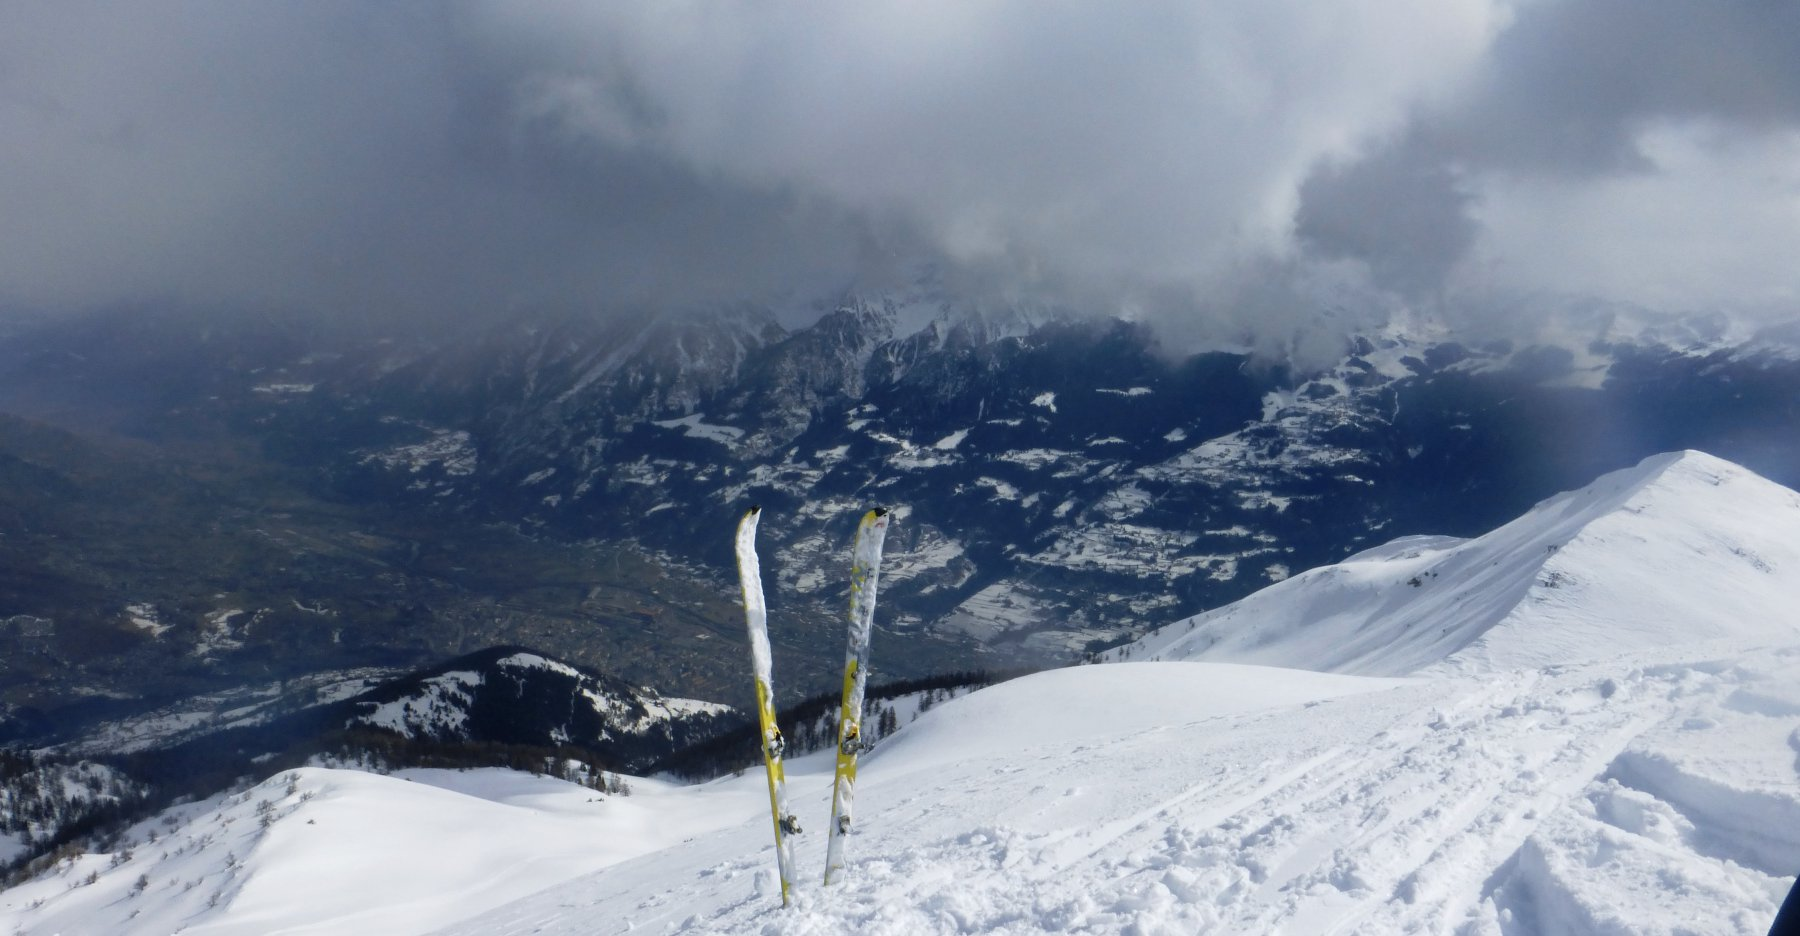 Aosta in basso